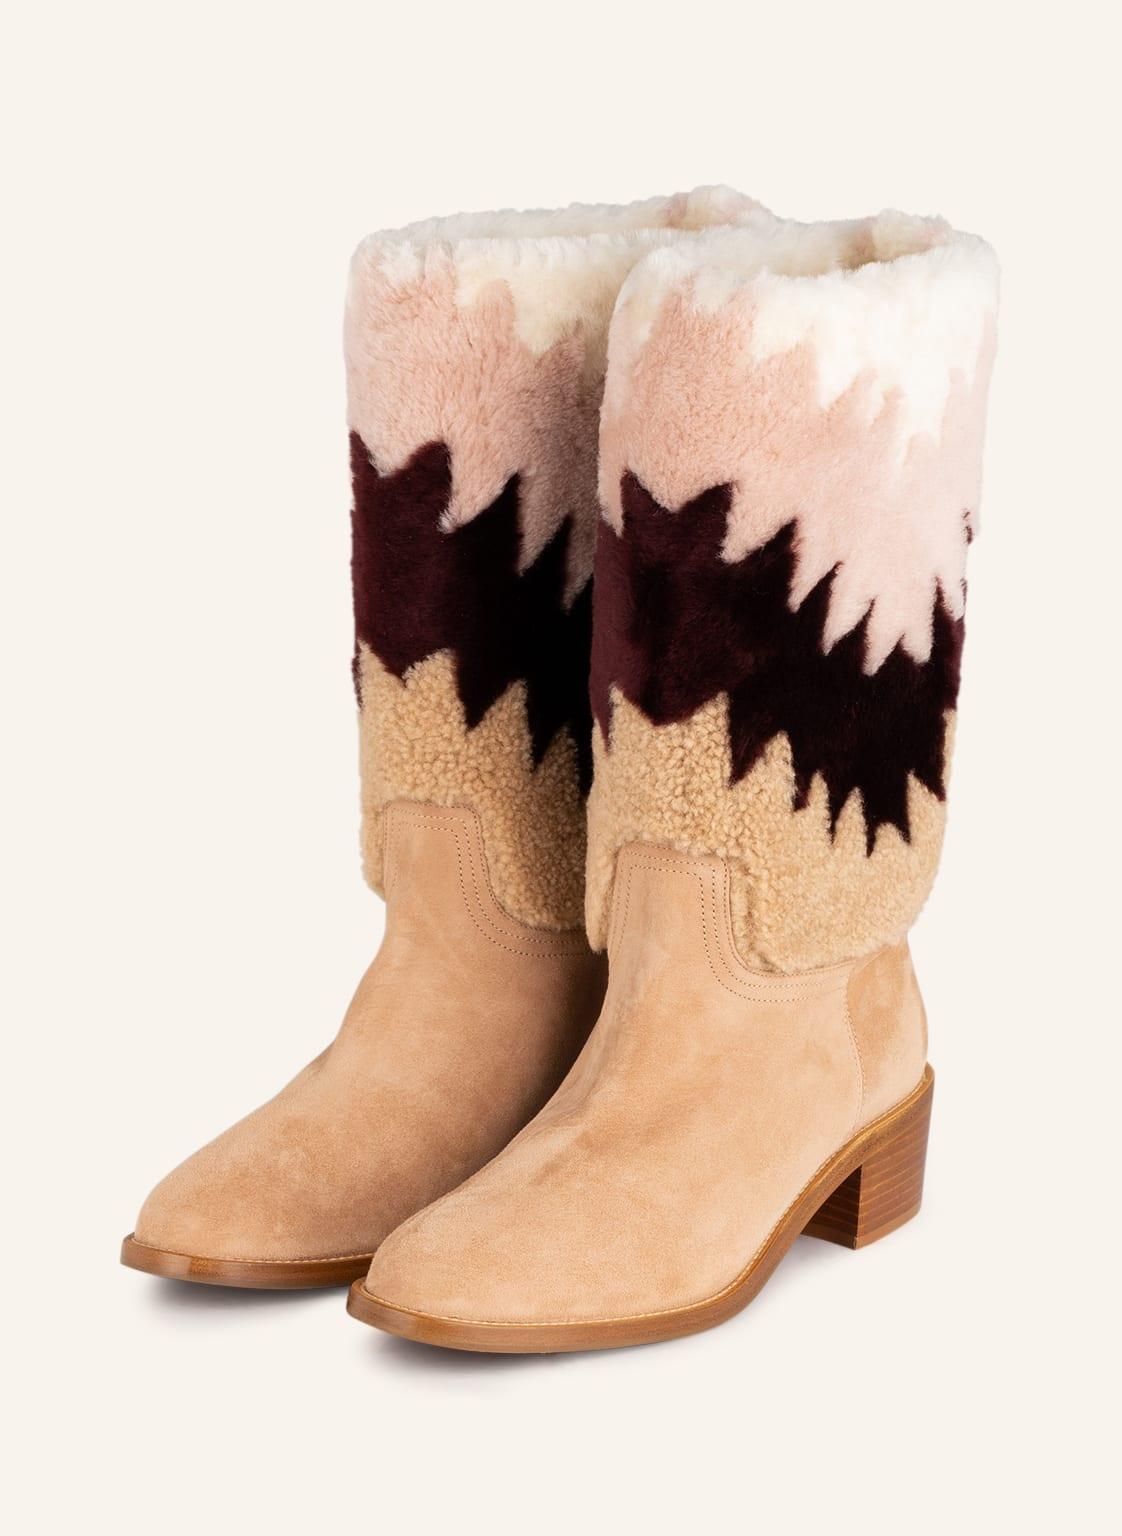 Image of Aquazzura Boots Nomade beige